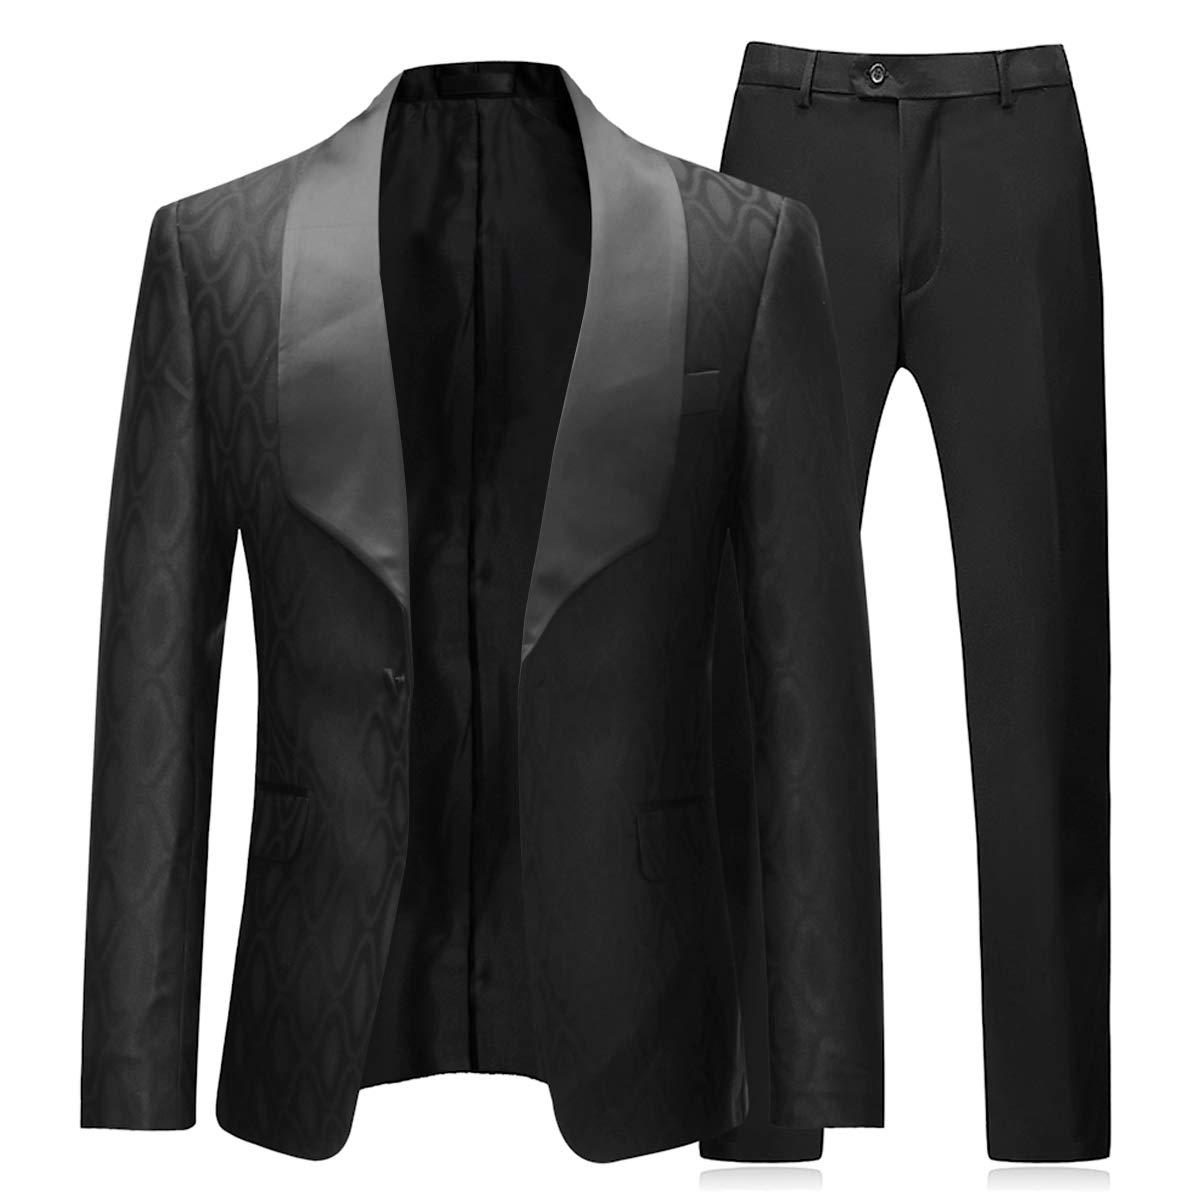 Boyland 2 Pieces Tuxedo Suits Jacquard Wide Shawl Collar One Button Formal Tux Sets Wedding Black by Boyland